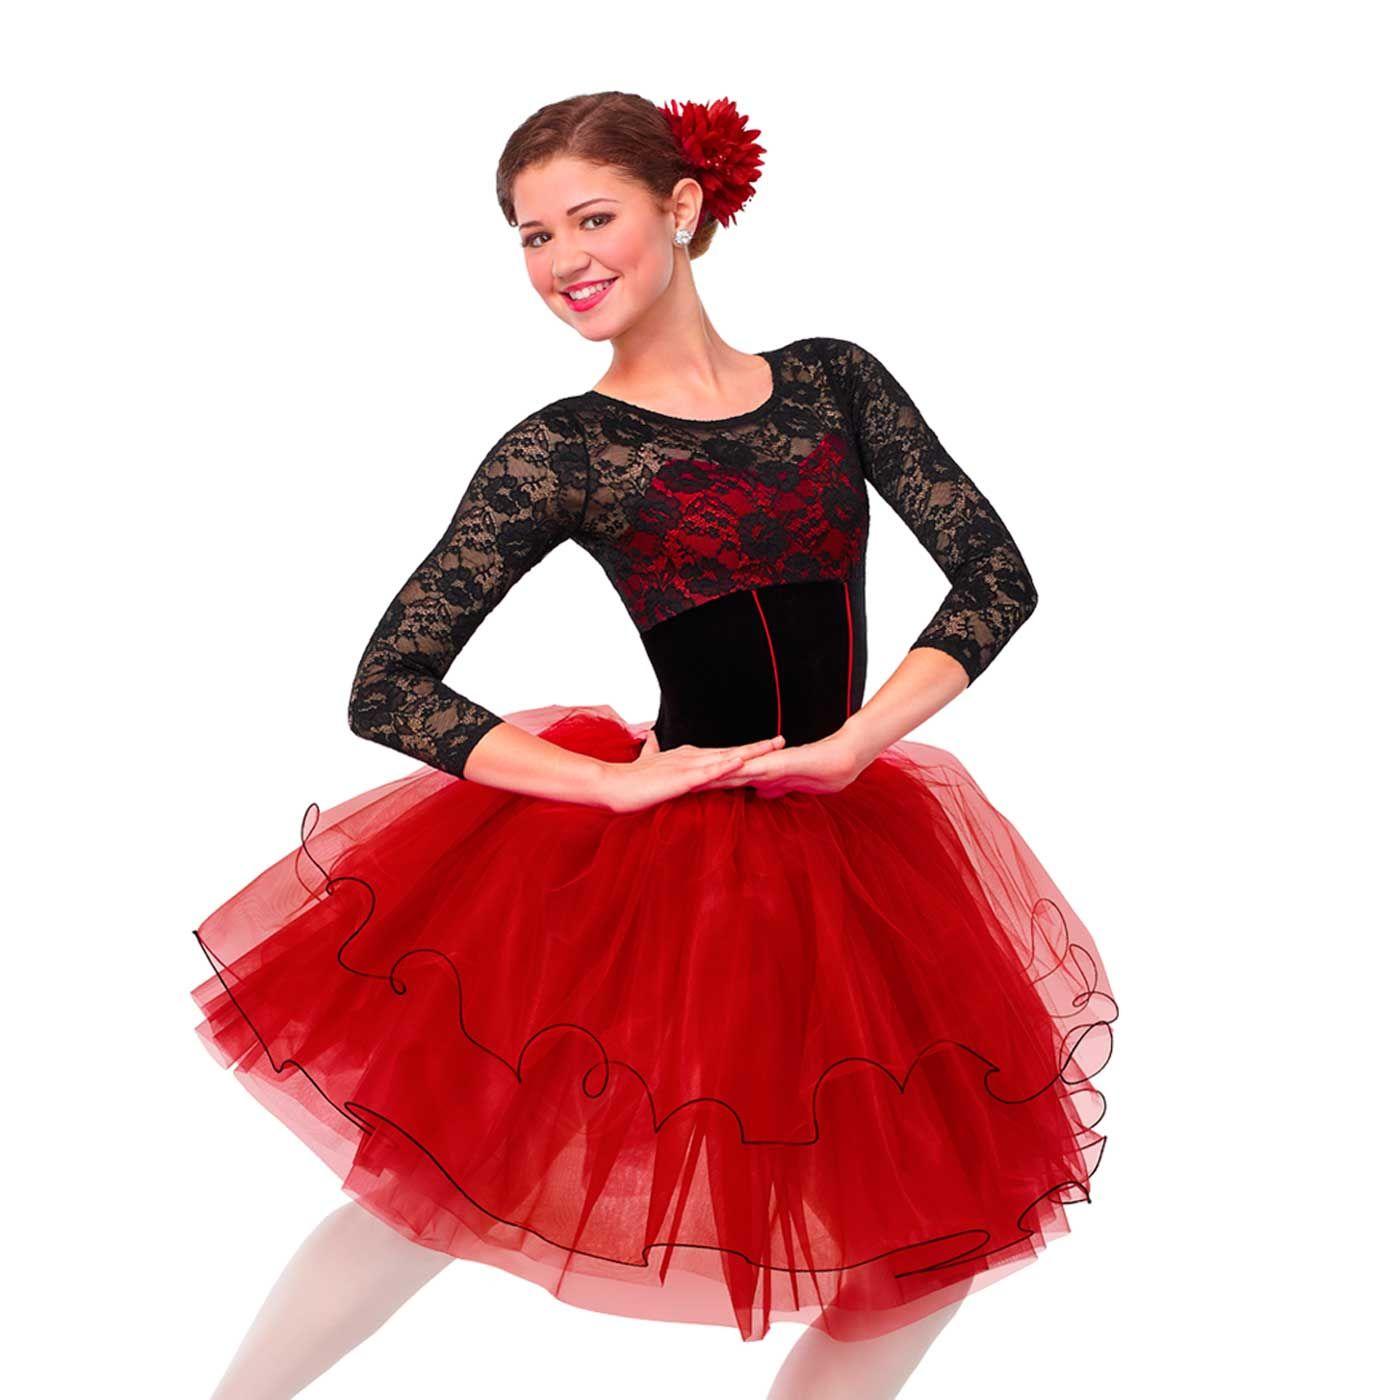 Curtain call glistening dew dance costumes pinterest dance